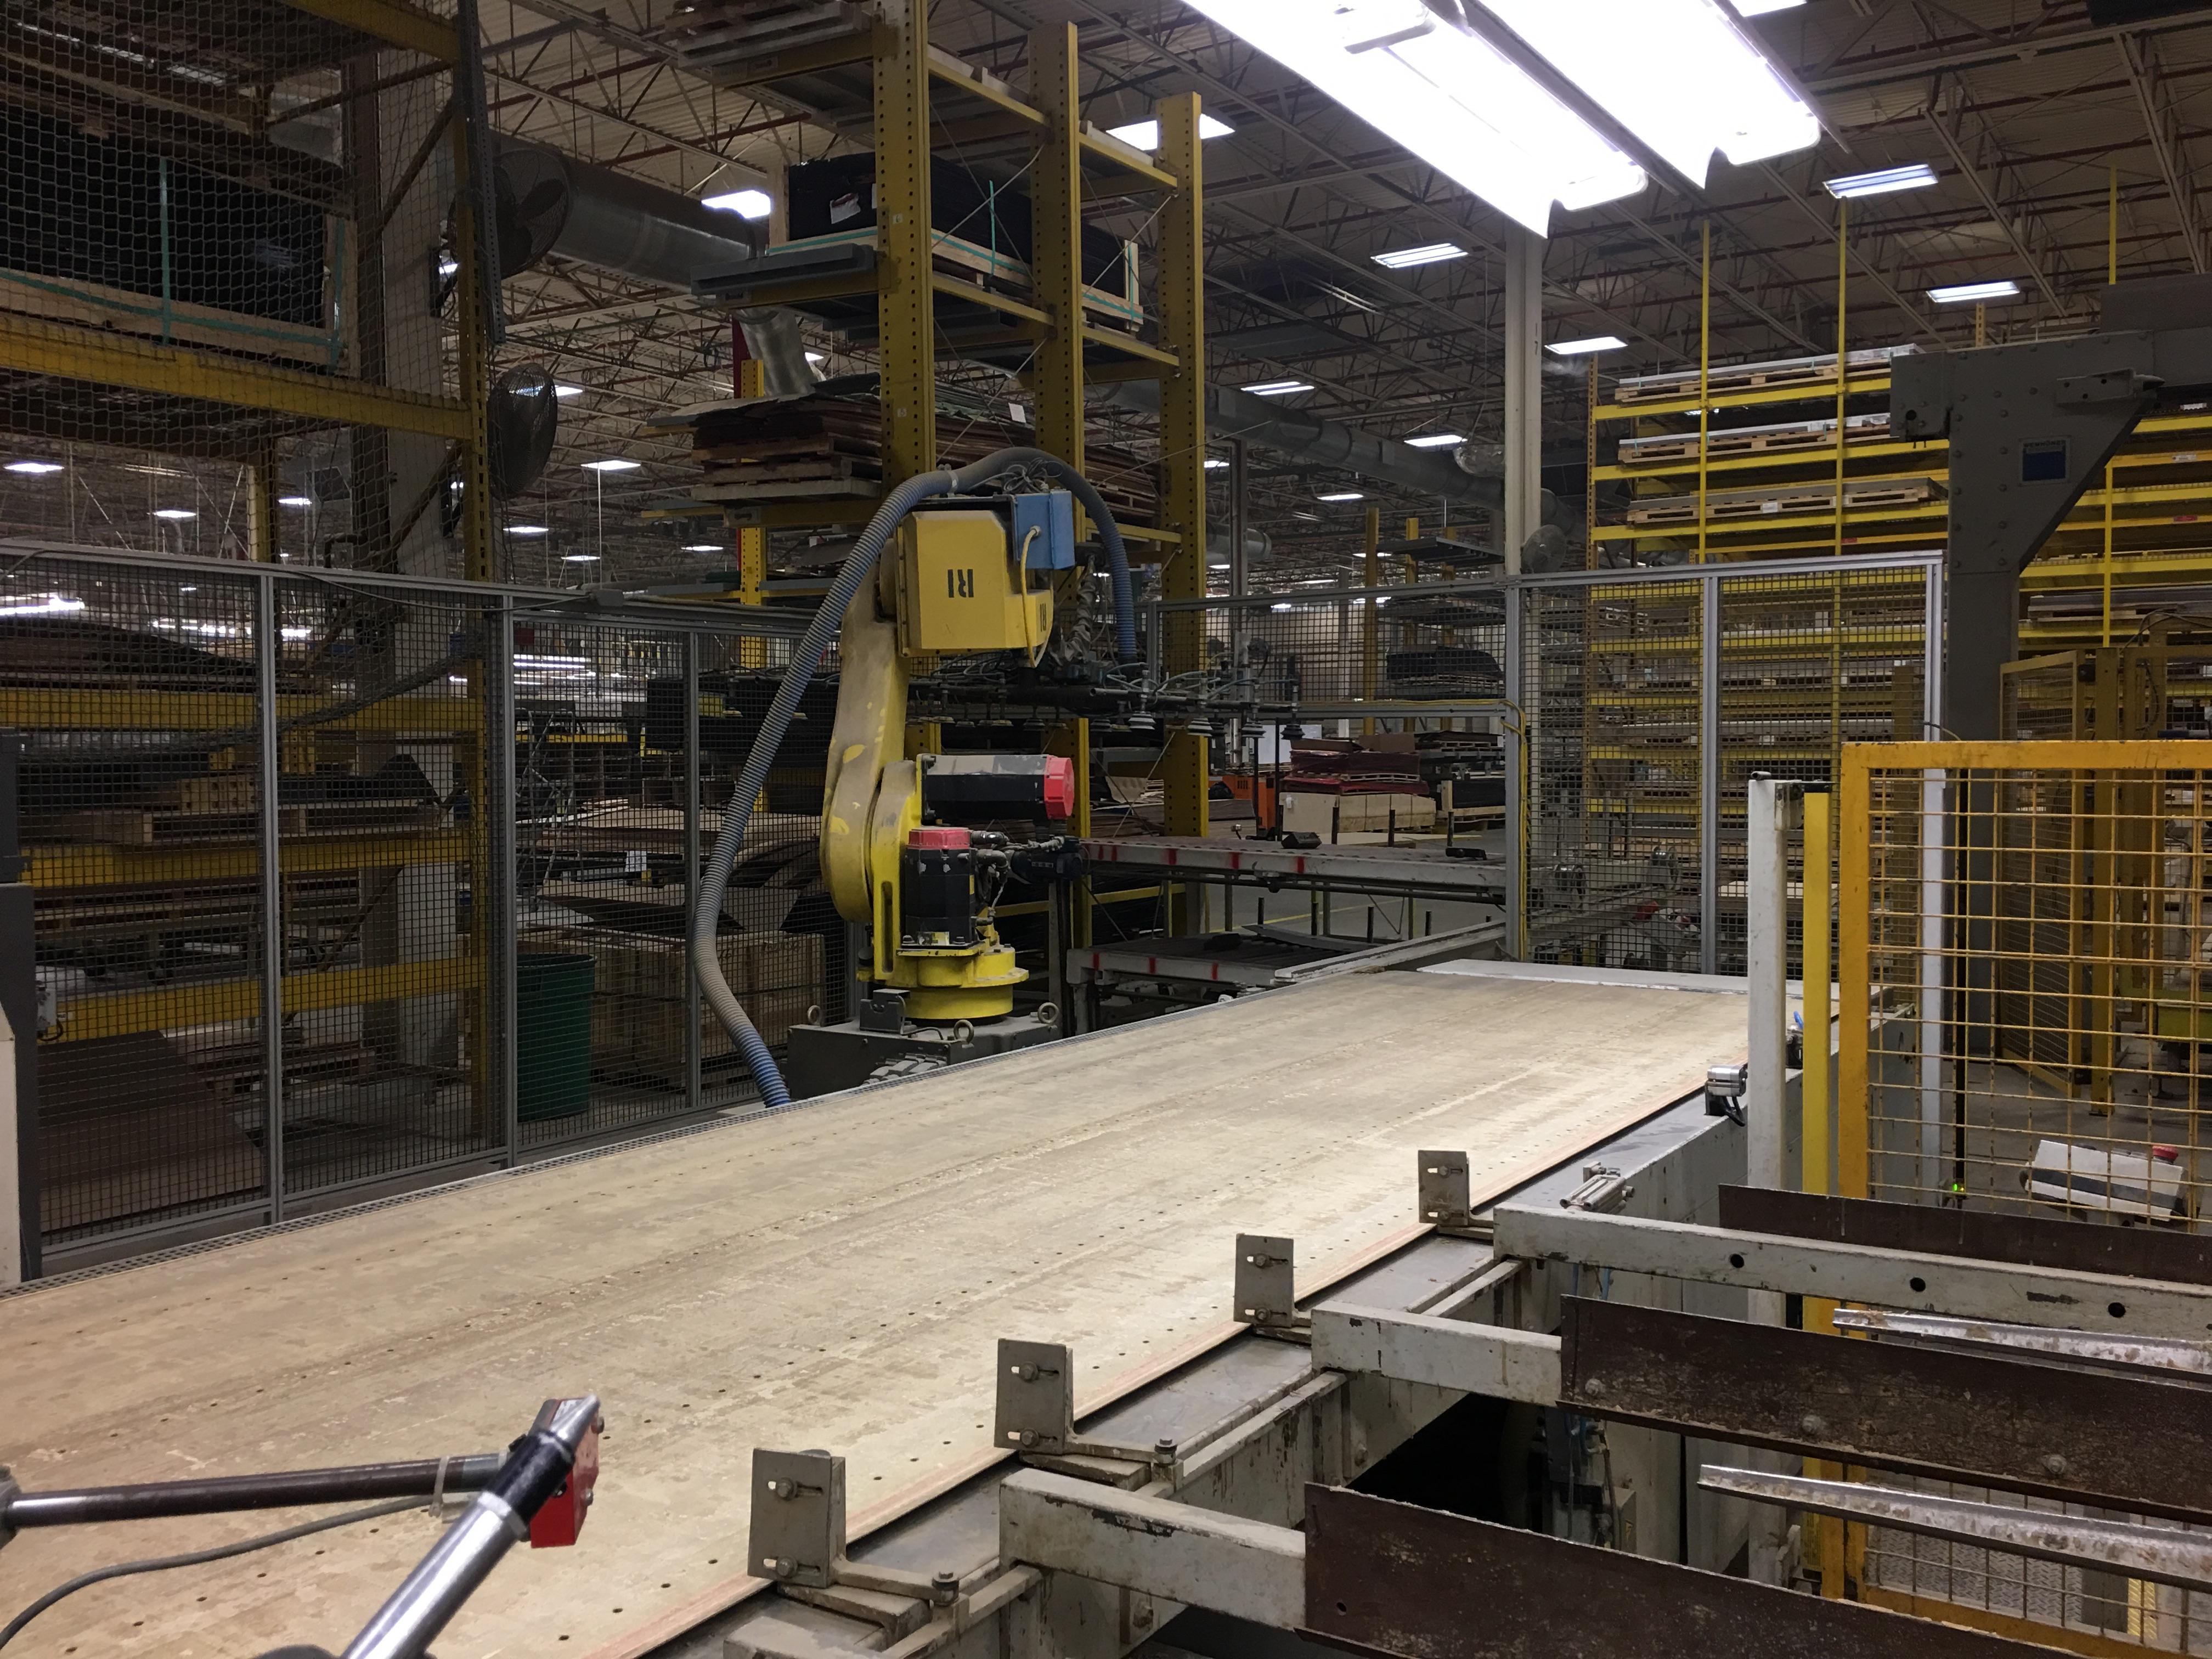 LOT OF 2 LOADING ROBOTS - LAYUP SYSTEM